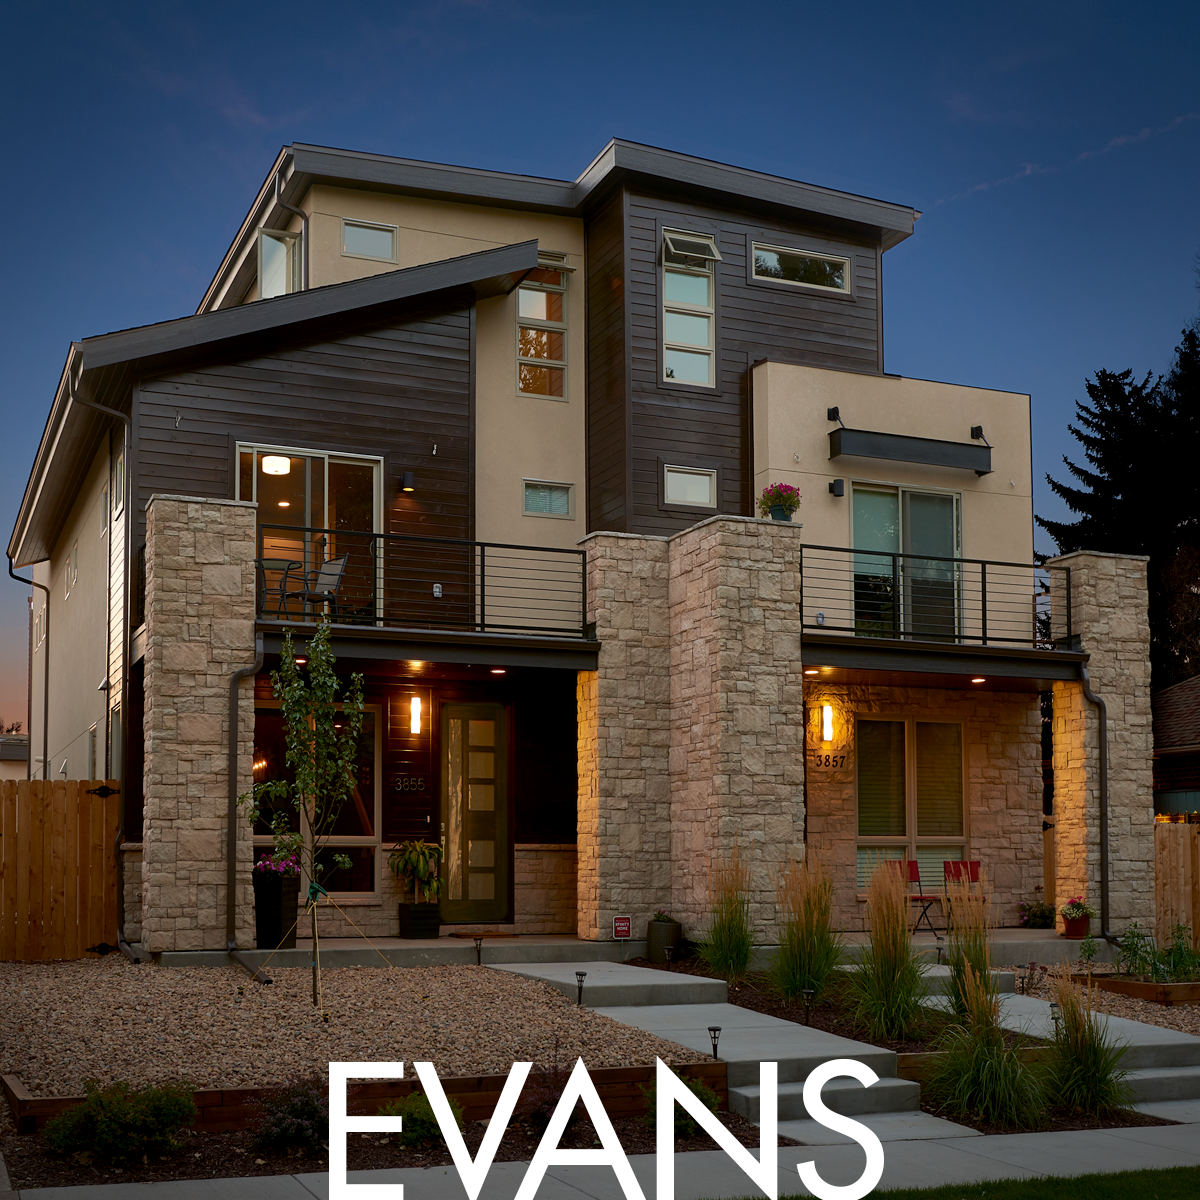 Evans_Duplex_Sq.png